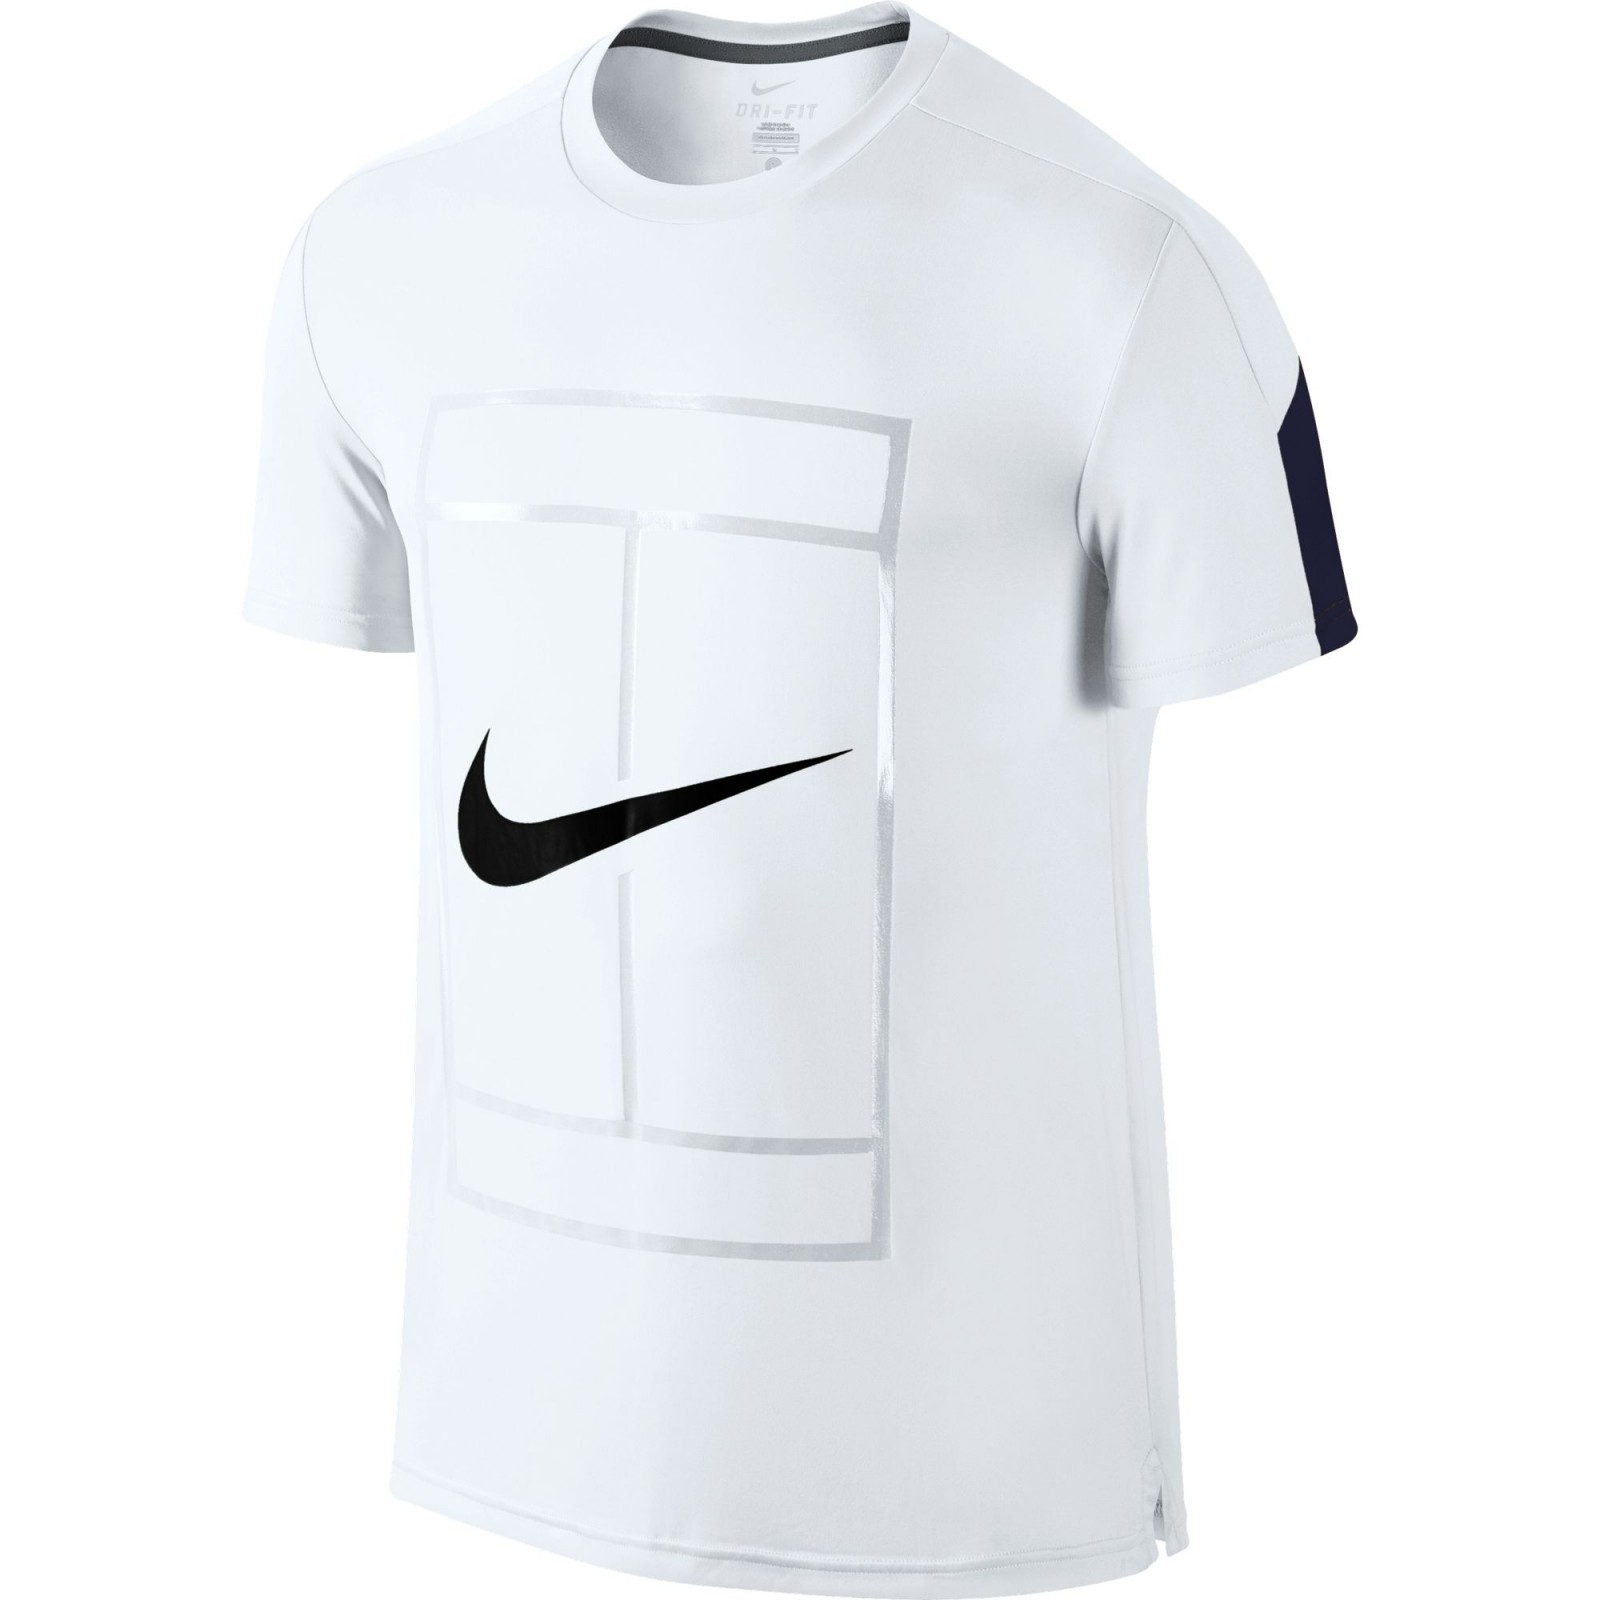 684a831dc558 Pánské tričko Nike COURT CREW GFX